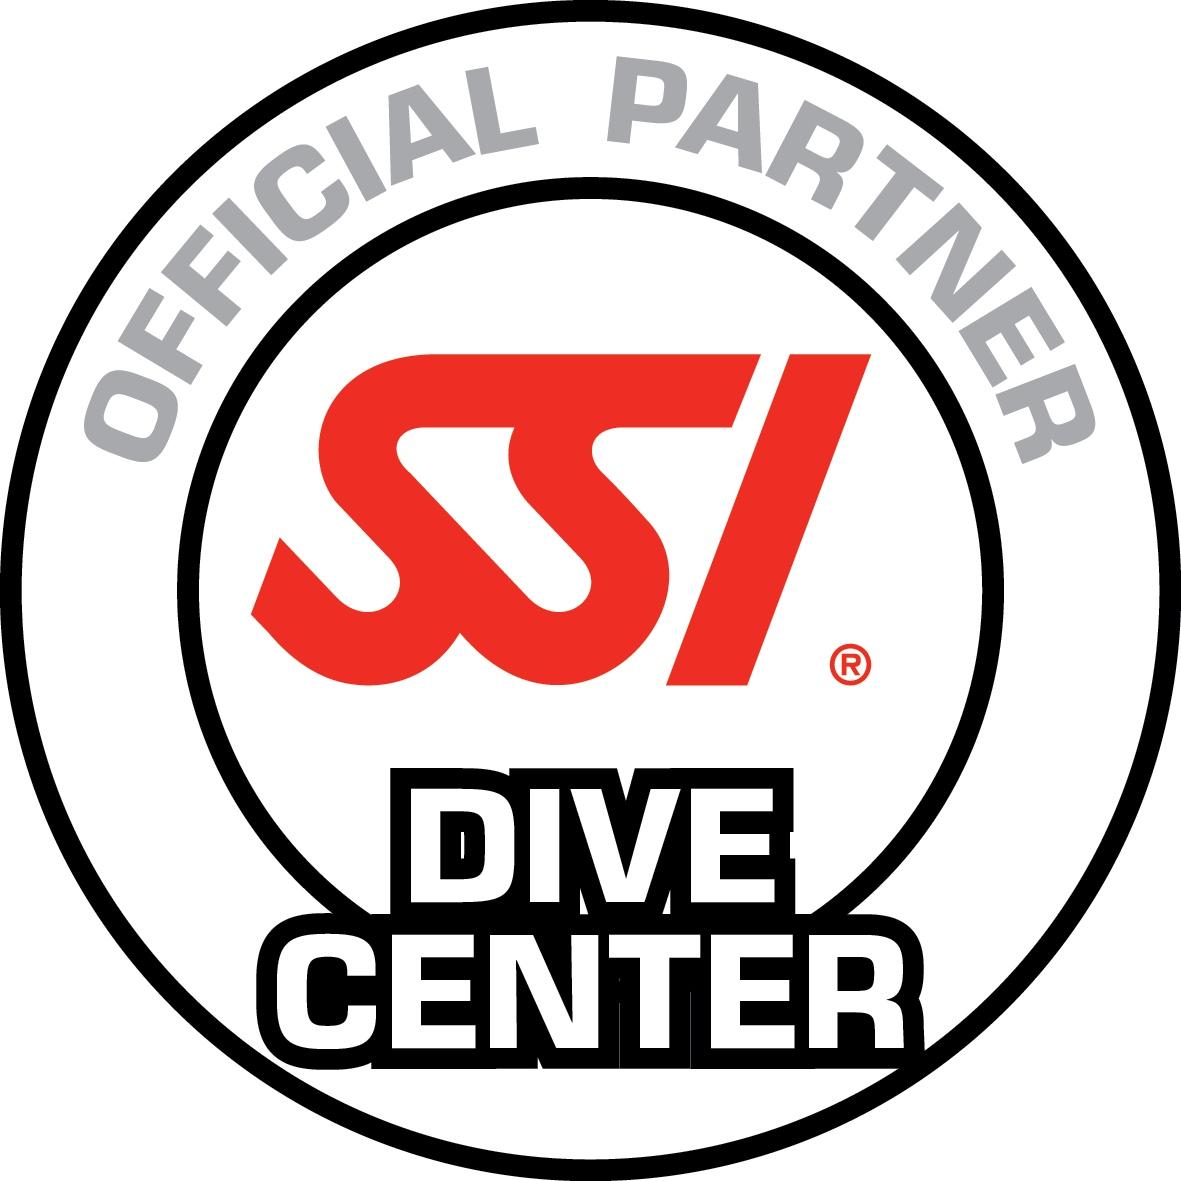 SSI_LOGO_Dive_Center_RGB.jpg